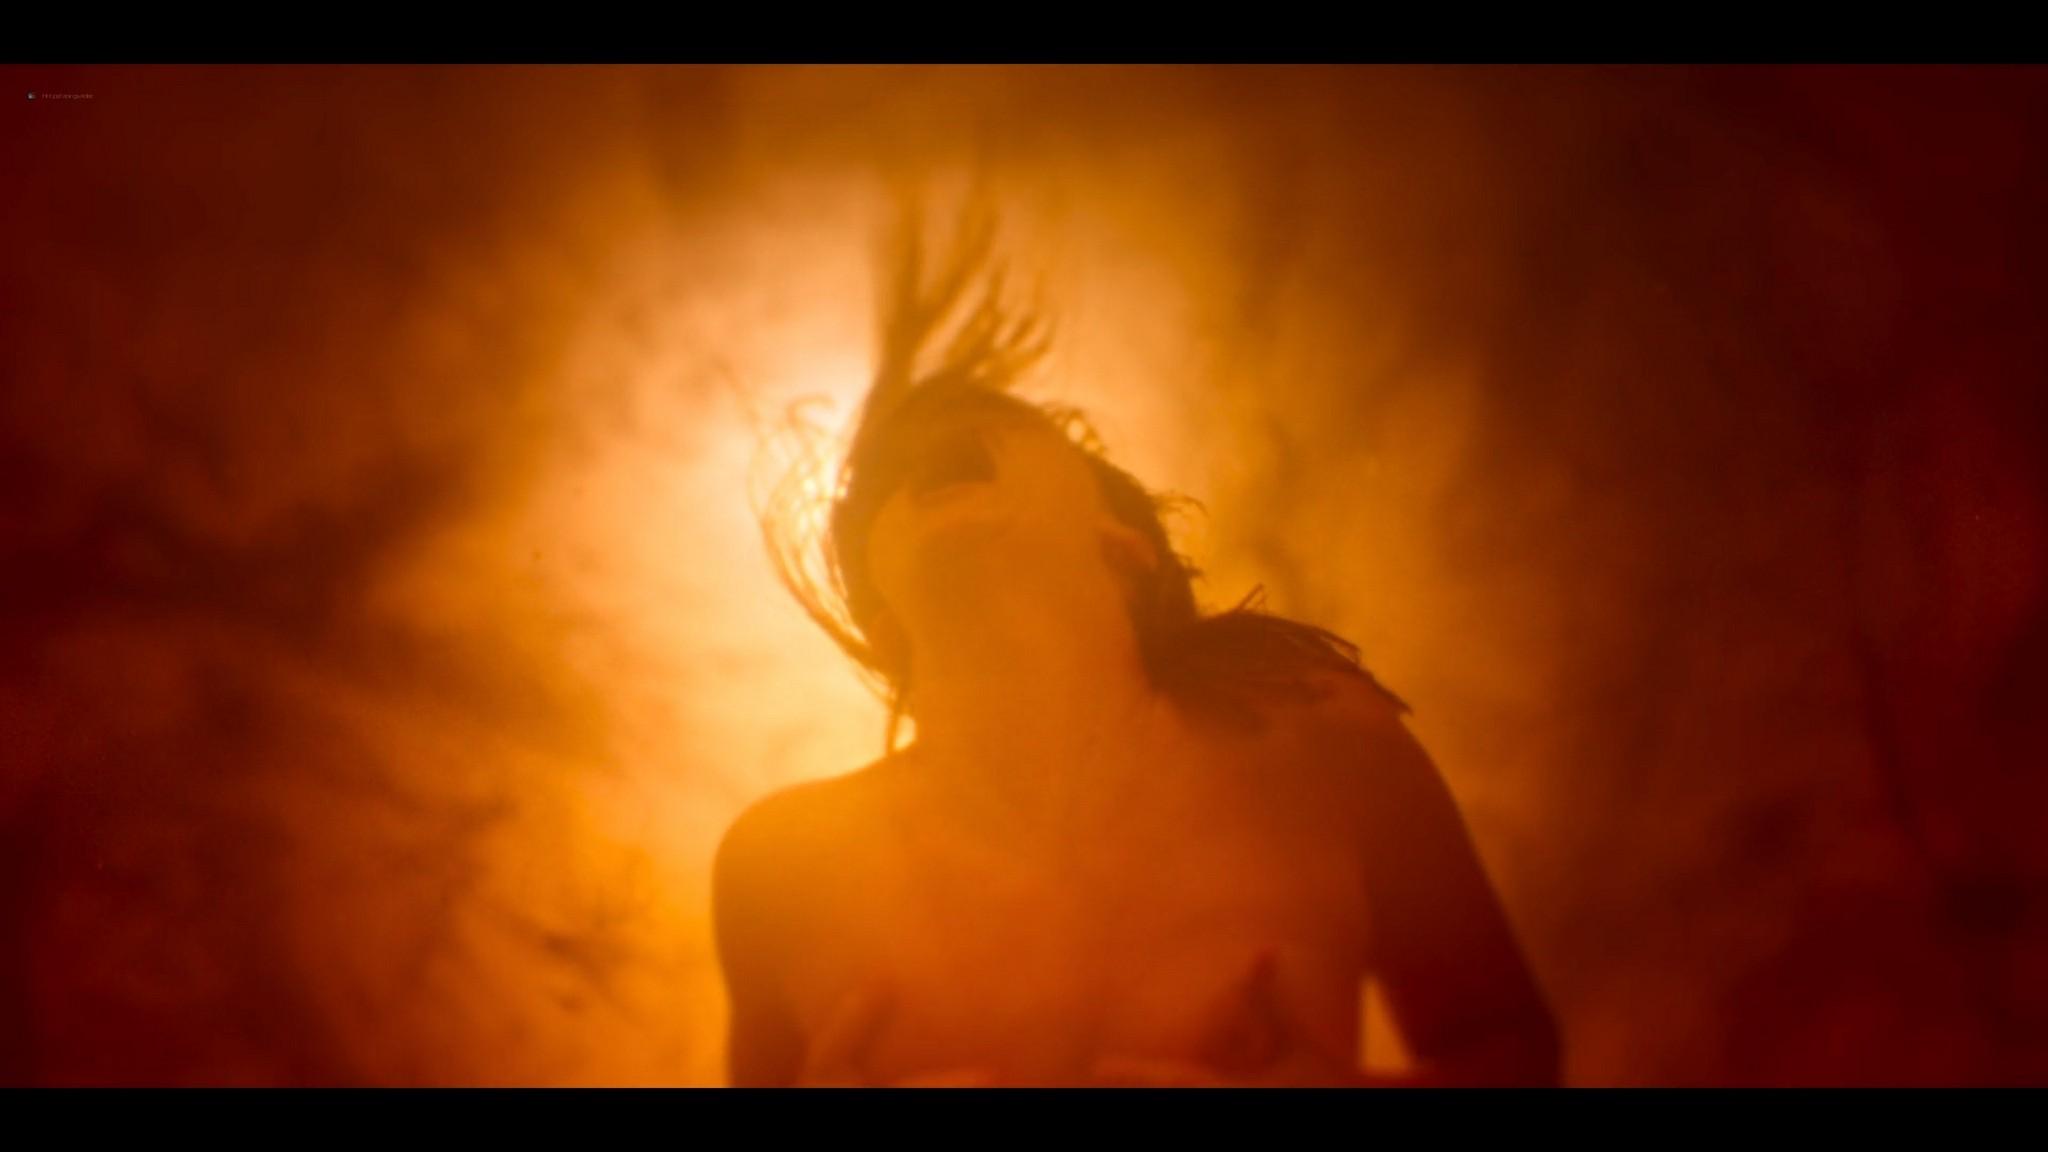 Karoline Hamm nude butt and sex Danica Curcic sexy Equinox 2020 S1 HD 1080p Web 005